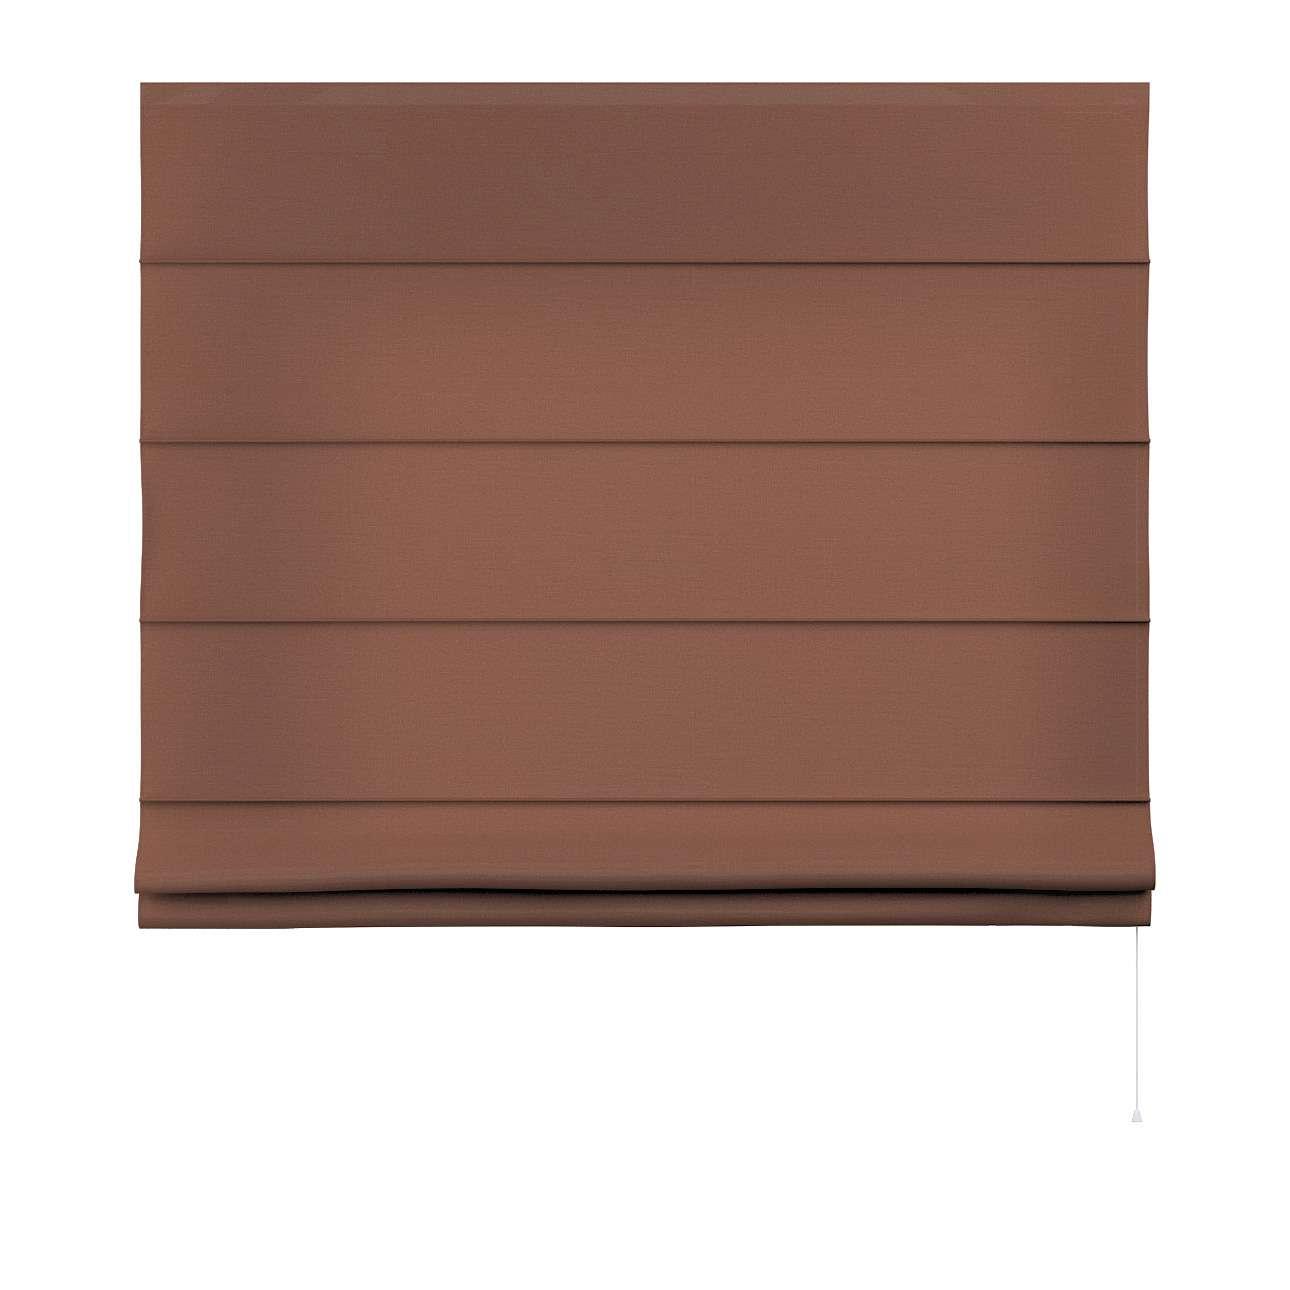 Foldegardin Capri<br/>Uden flæsekant 80 x 170 cm fra kollektionen Loneta, Stof: 133-09